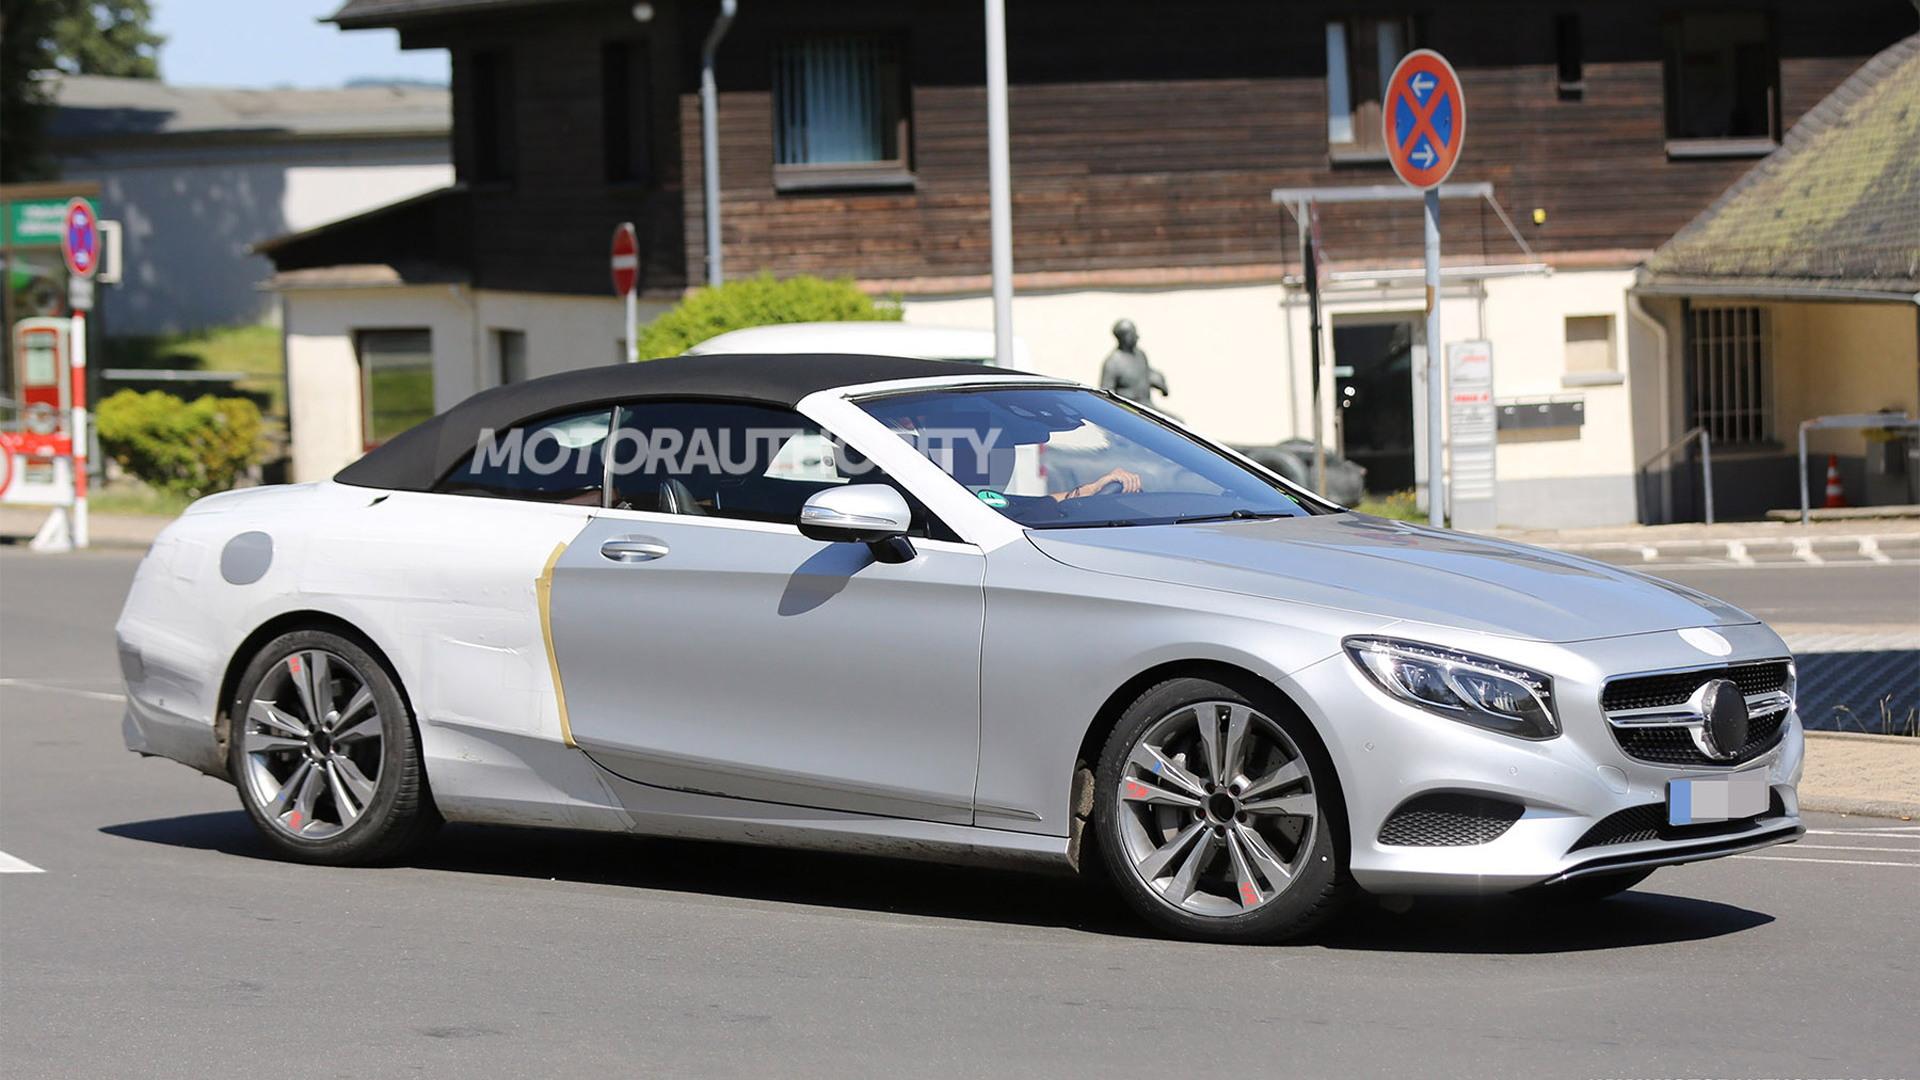 2017 Mercedes-Benz S-Class Cabriolet spy shots - Image via S. Baldauf/SB-Medien